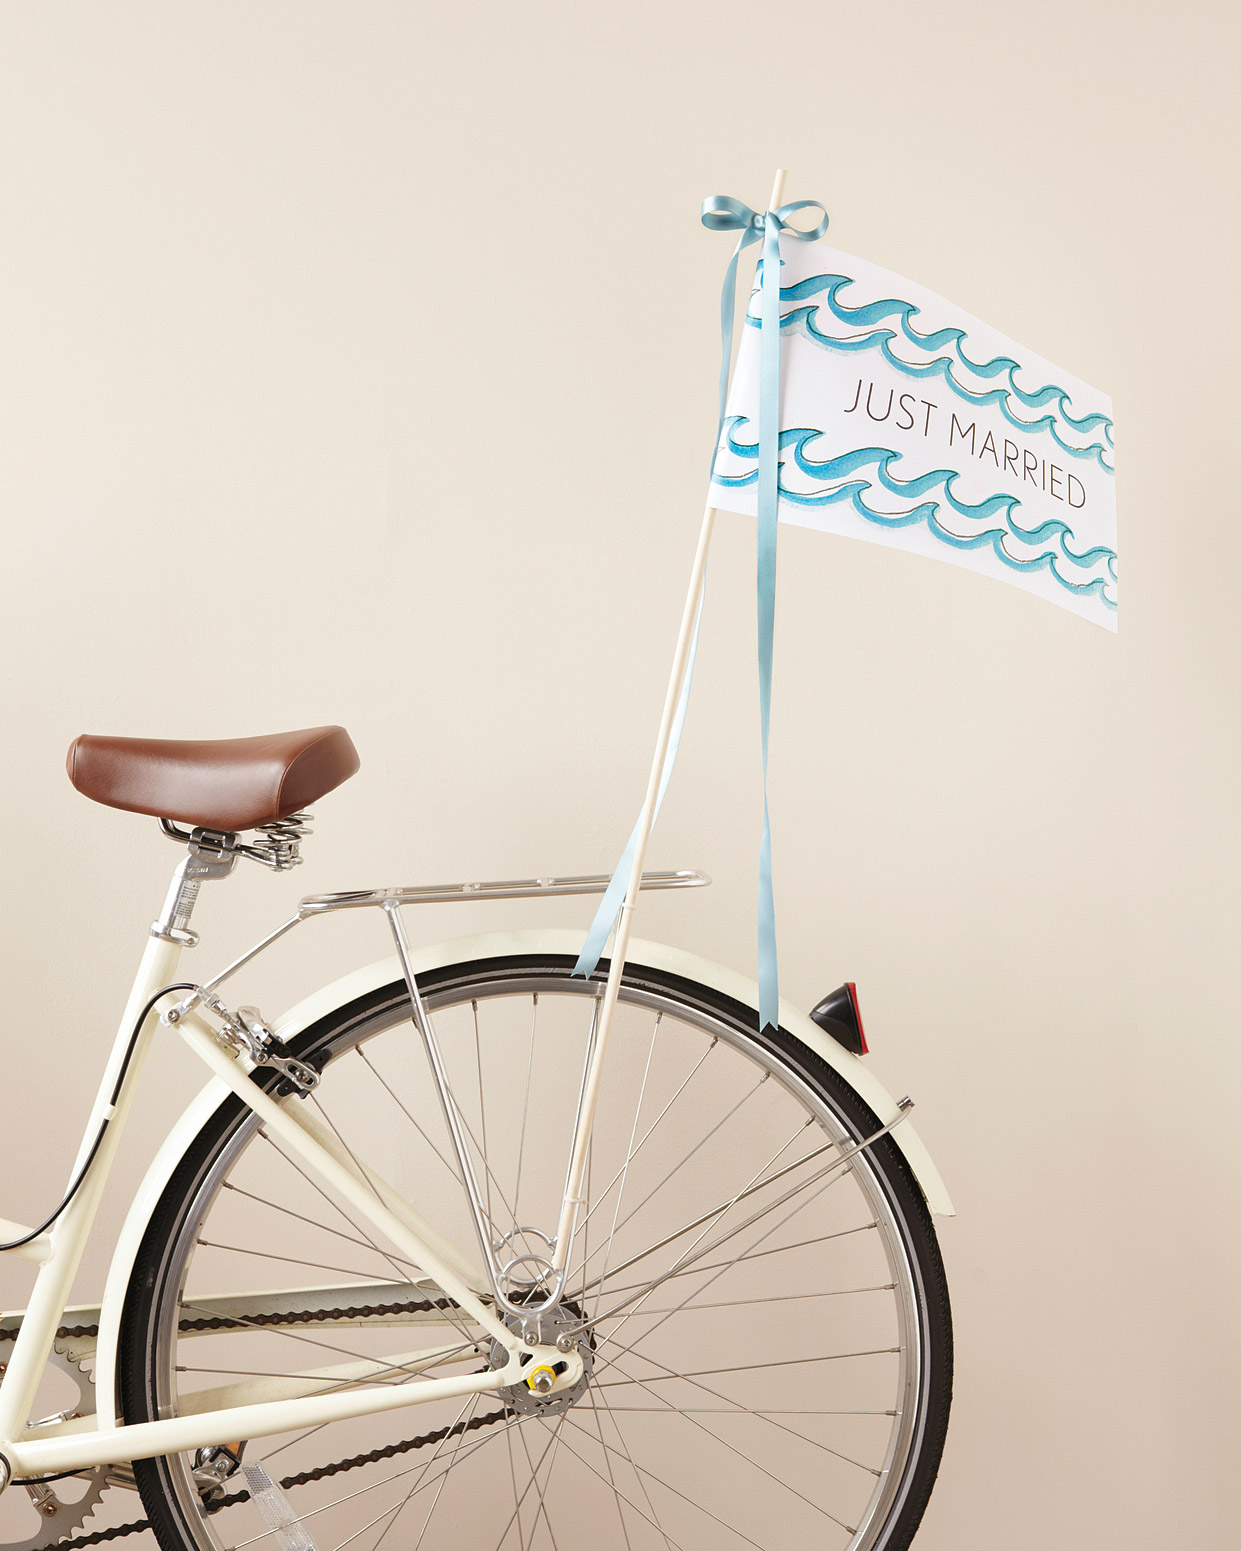 clip-art-bicycle-flag-mwd107615.jpg